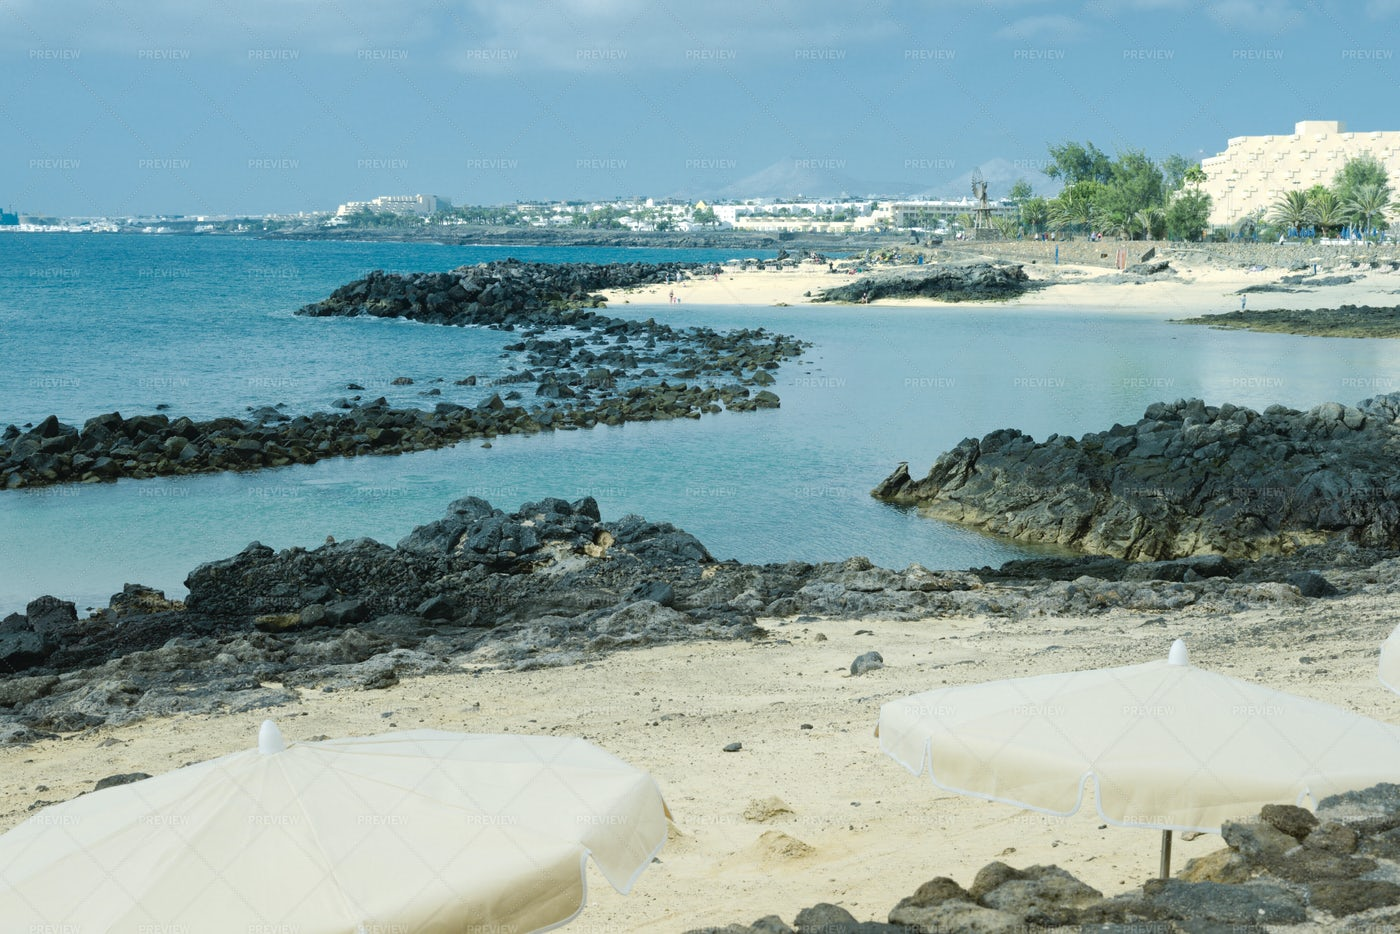 Black Rocks On Beach: Stock Photos